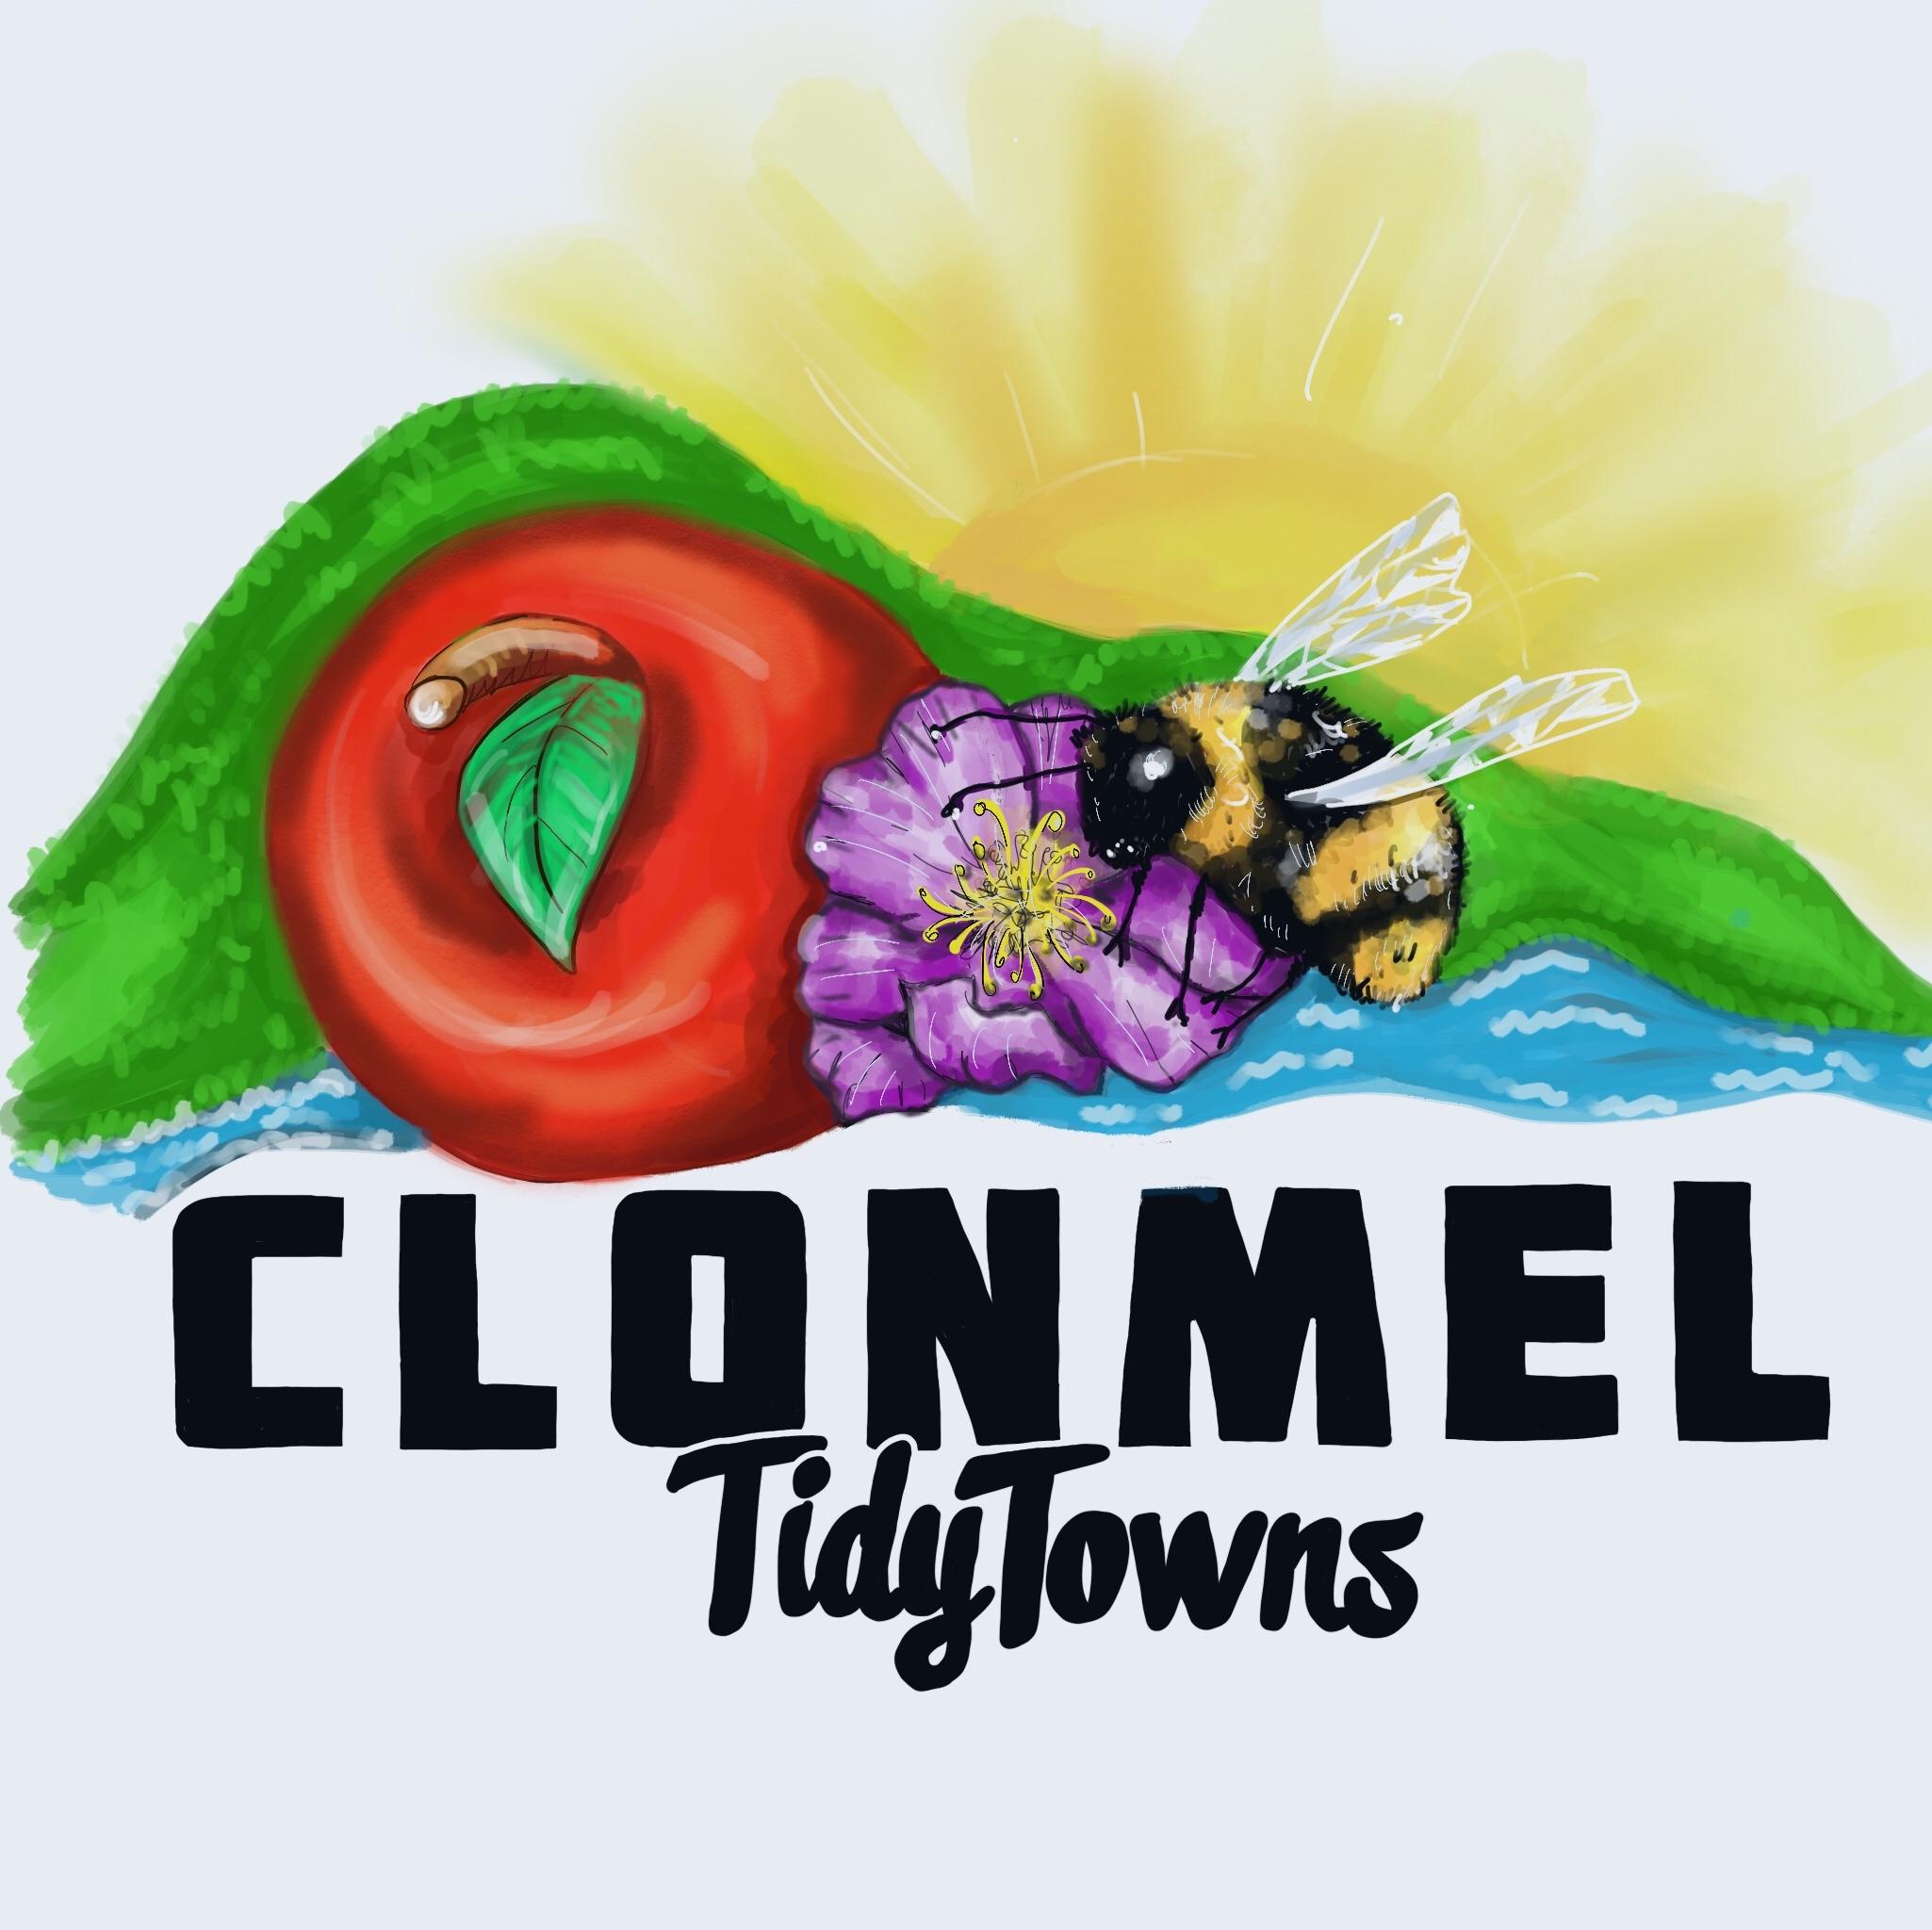 Clonmel Tidy Towns